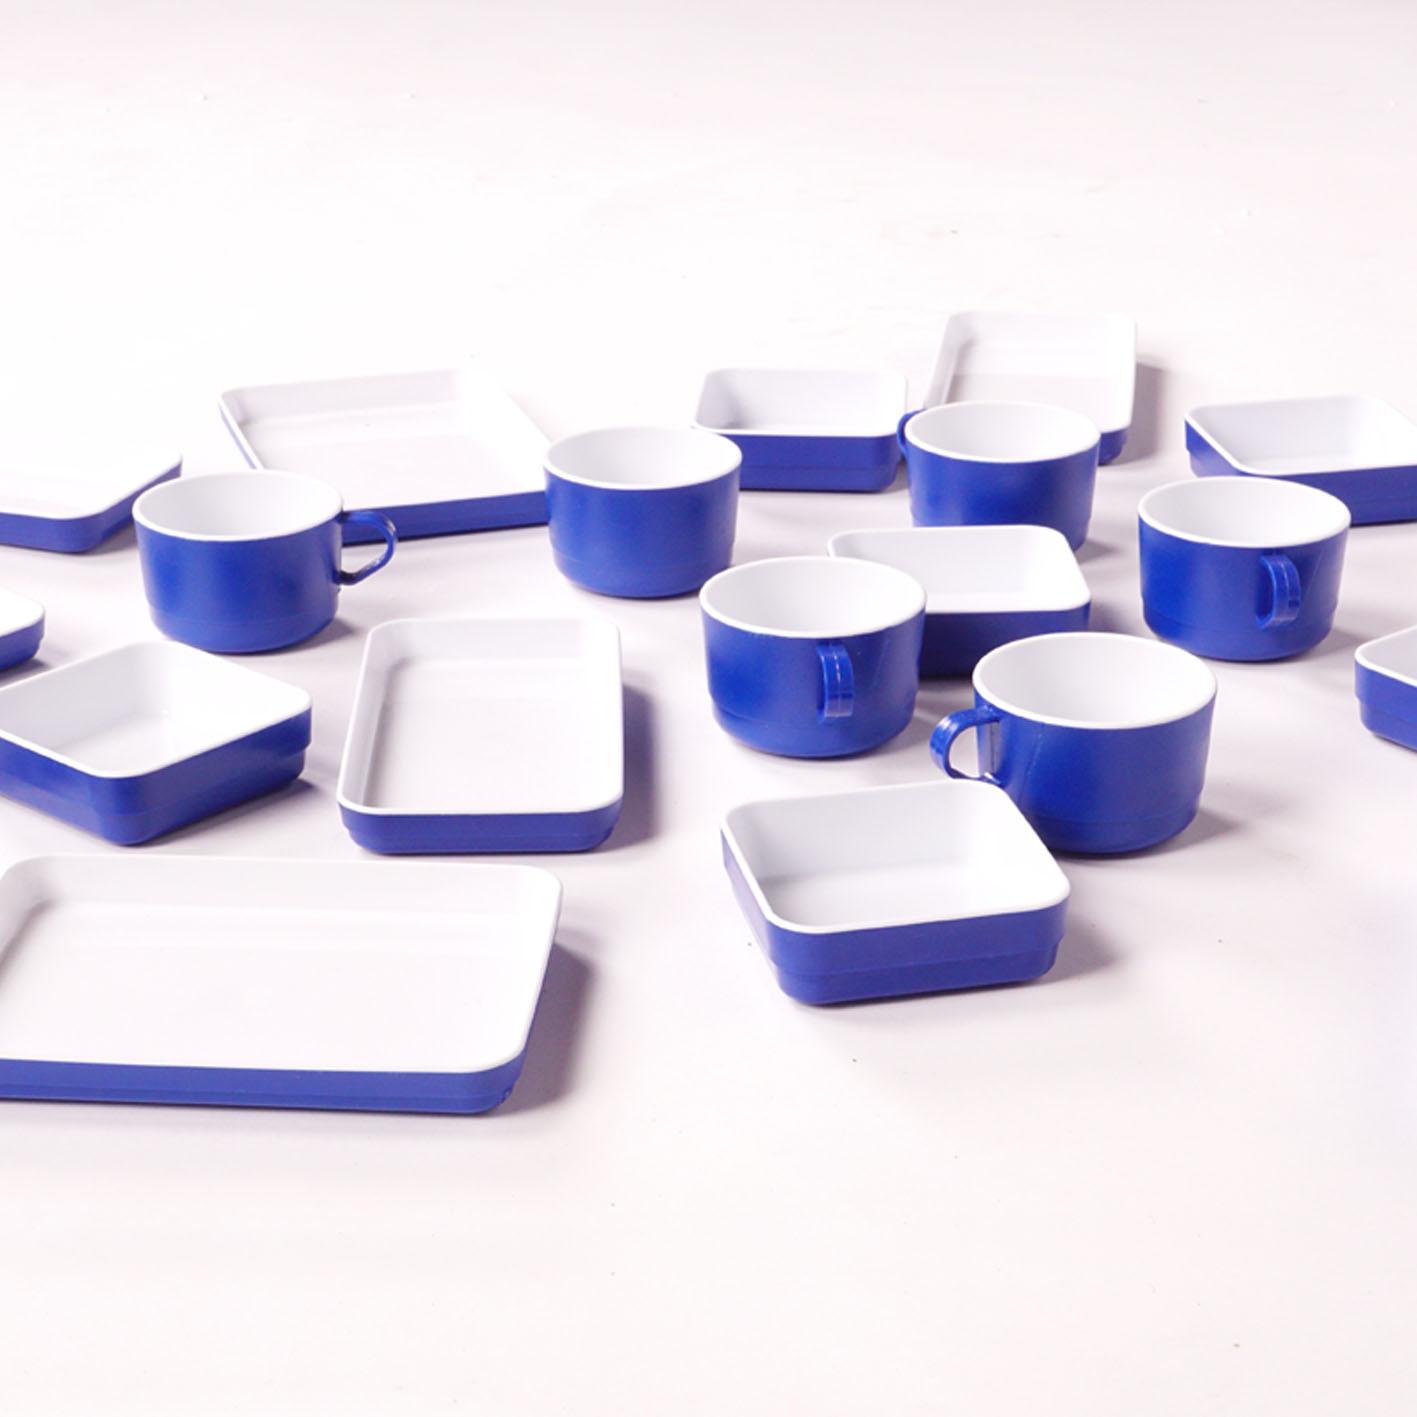 Flugzeug Kunststoffgeschirr Set 22 Teilig